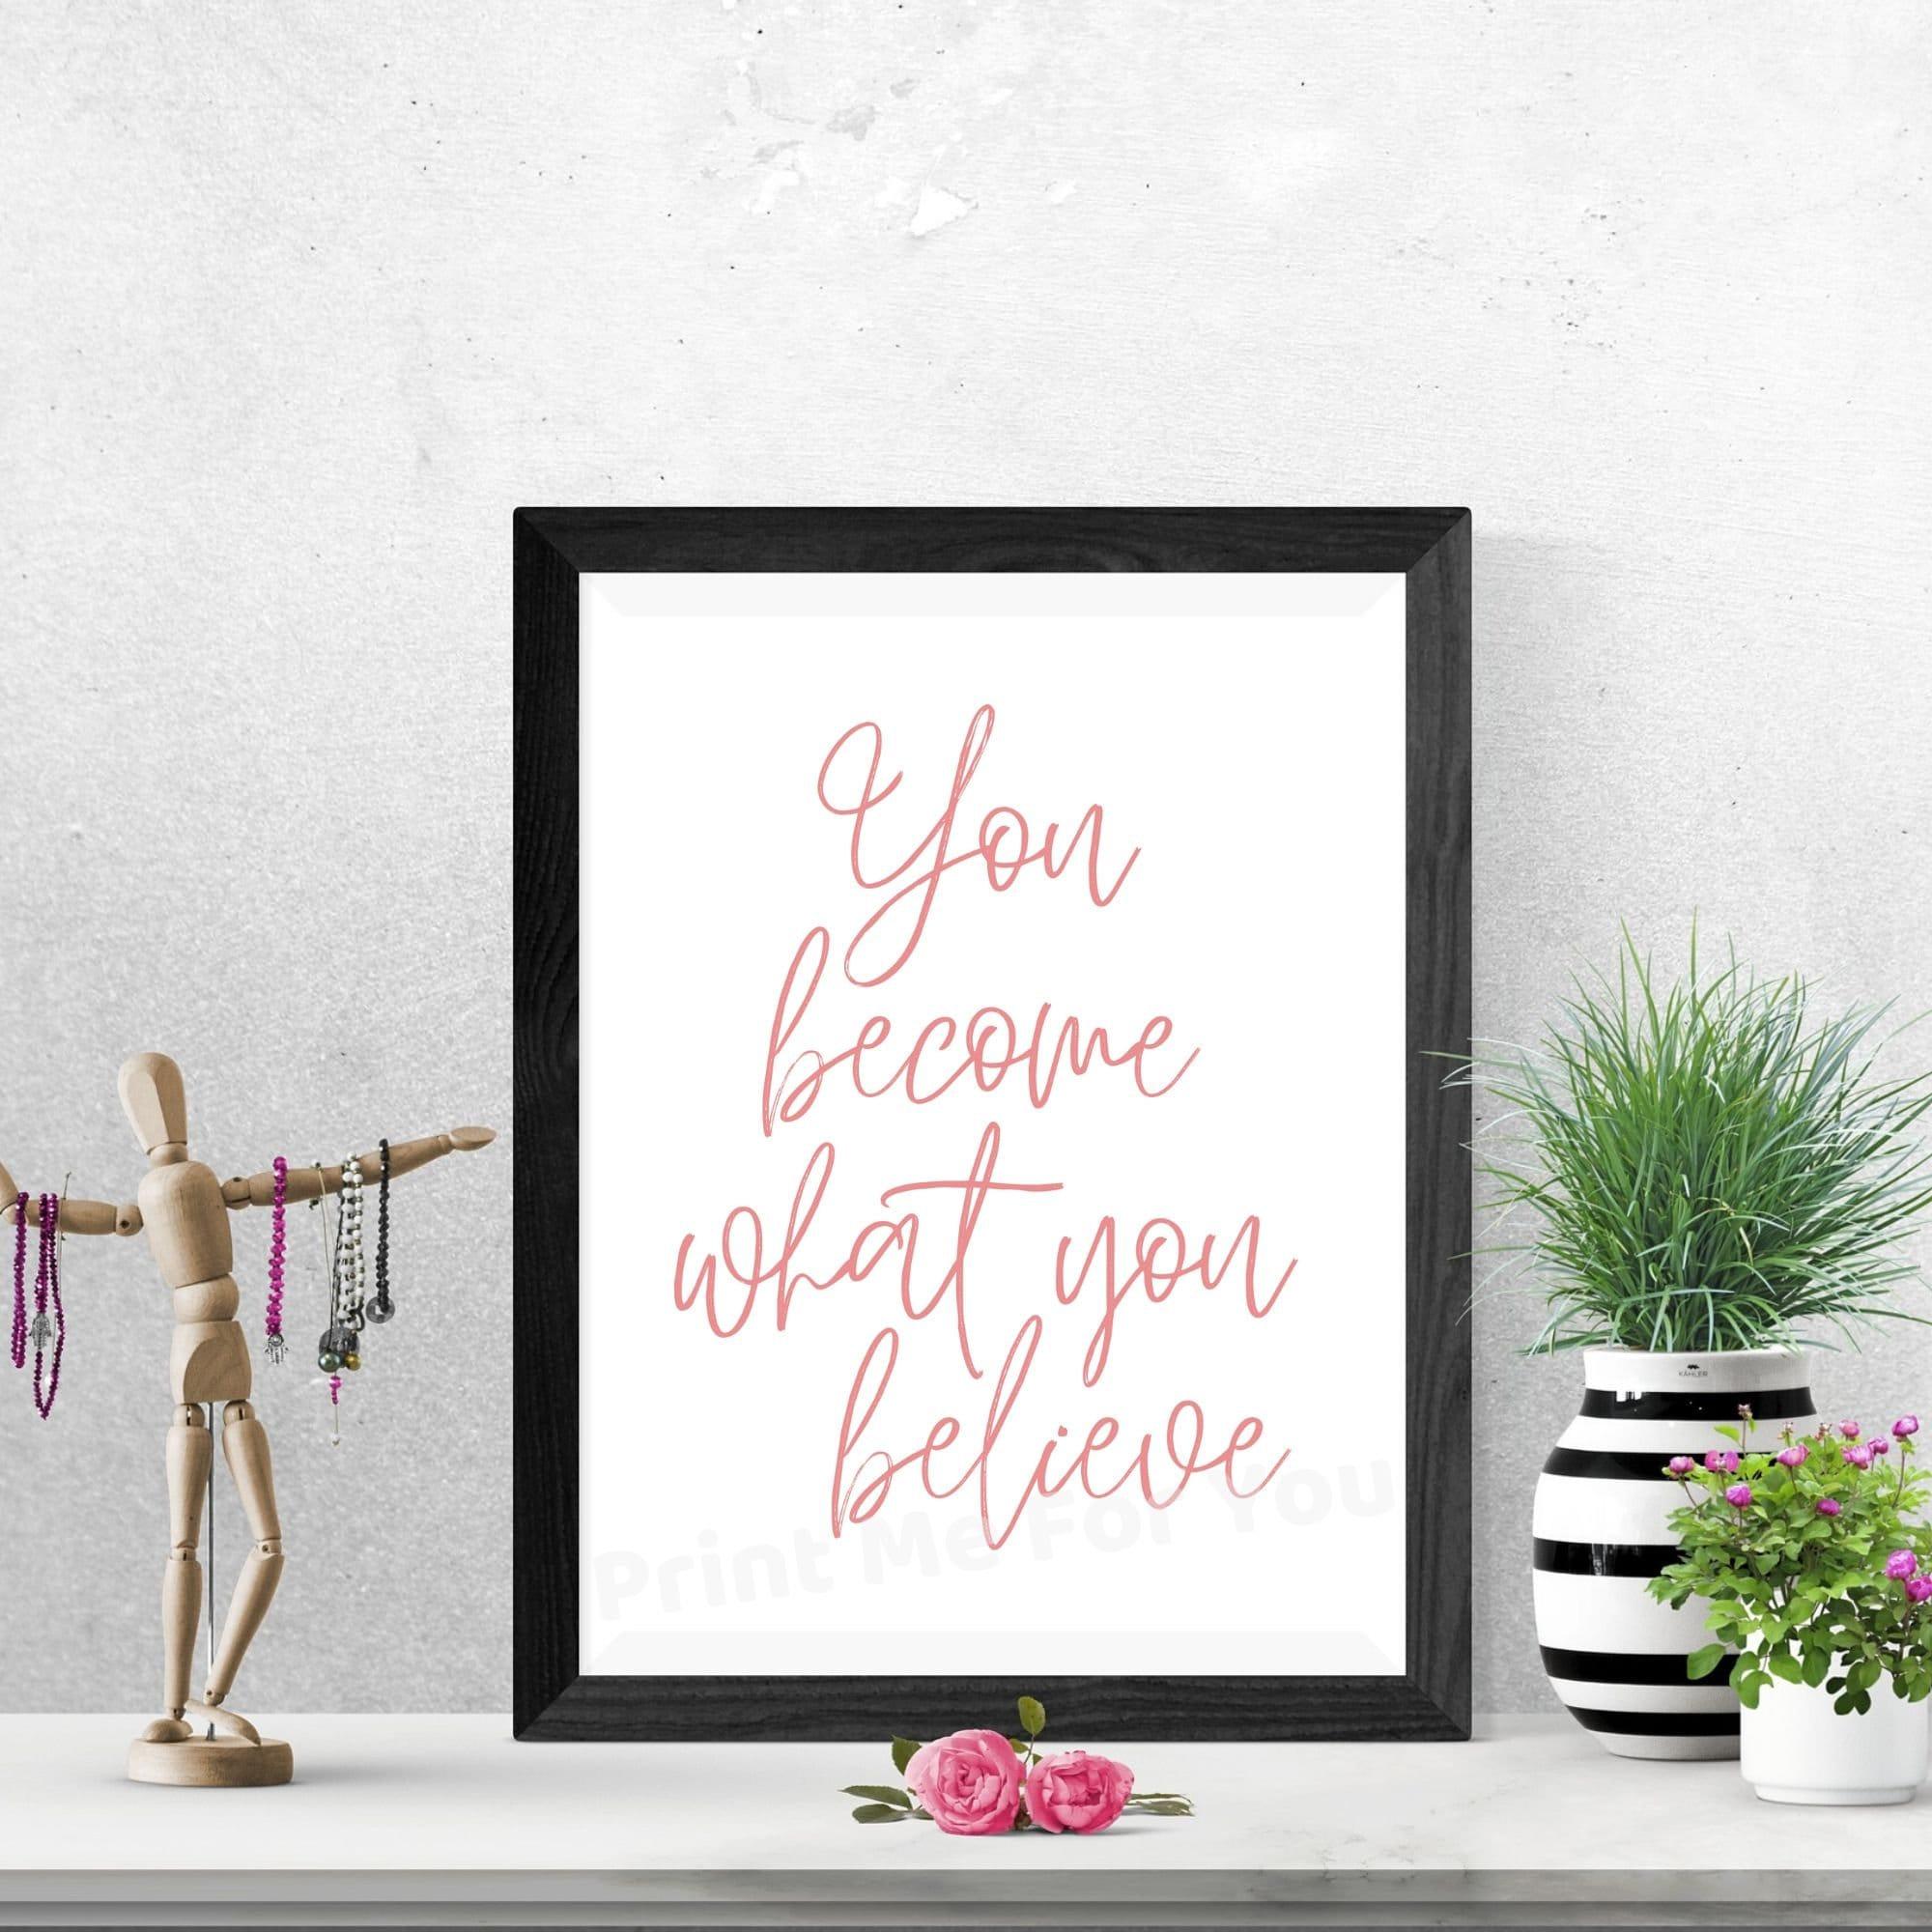 Digital Download Bedroom Art Self Affirmation Boho Wall Decor Women S International Day Love Yourself Print Self Love Printable Wall Art Digital Prints Art Collectibles Delage Com Br